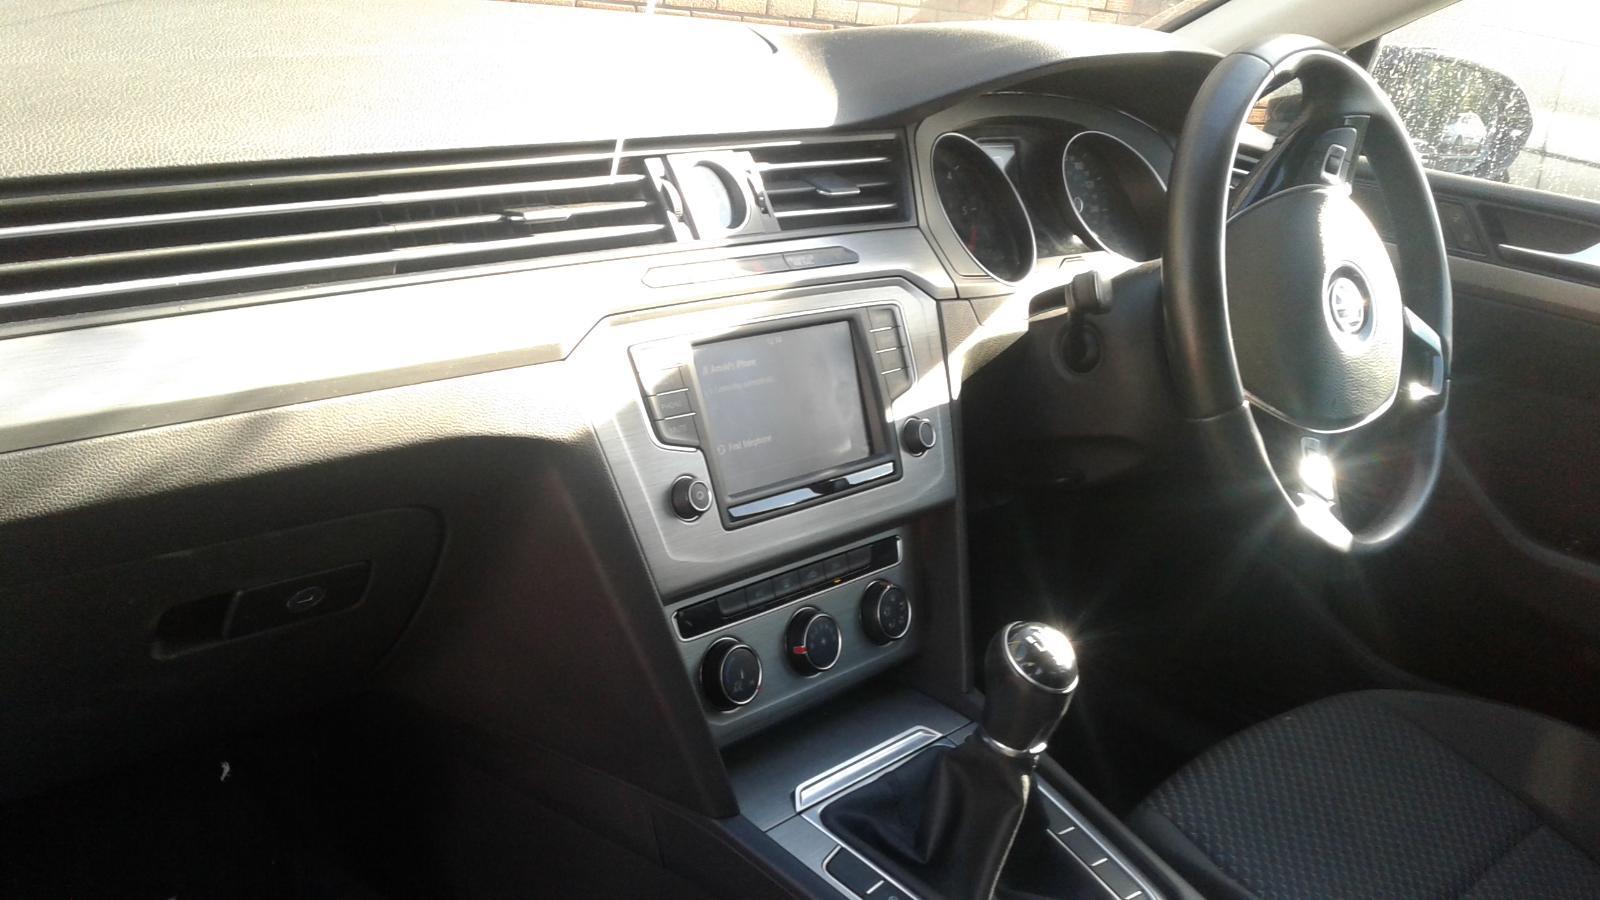 2016 Volkswagen PASSAT S TDI BLUEMOTION TECHNOLOGY Image